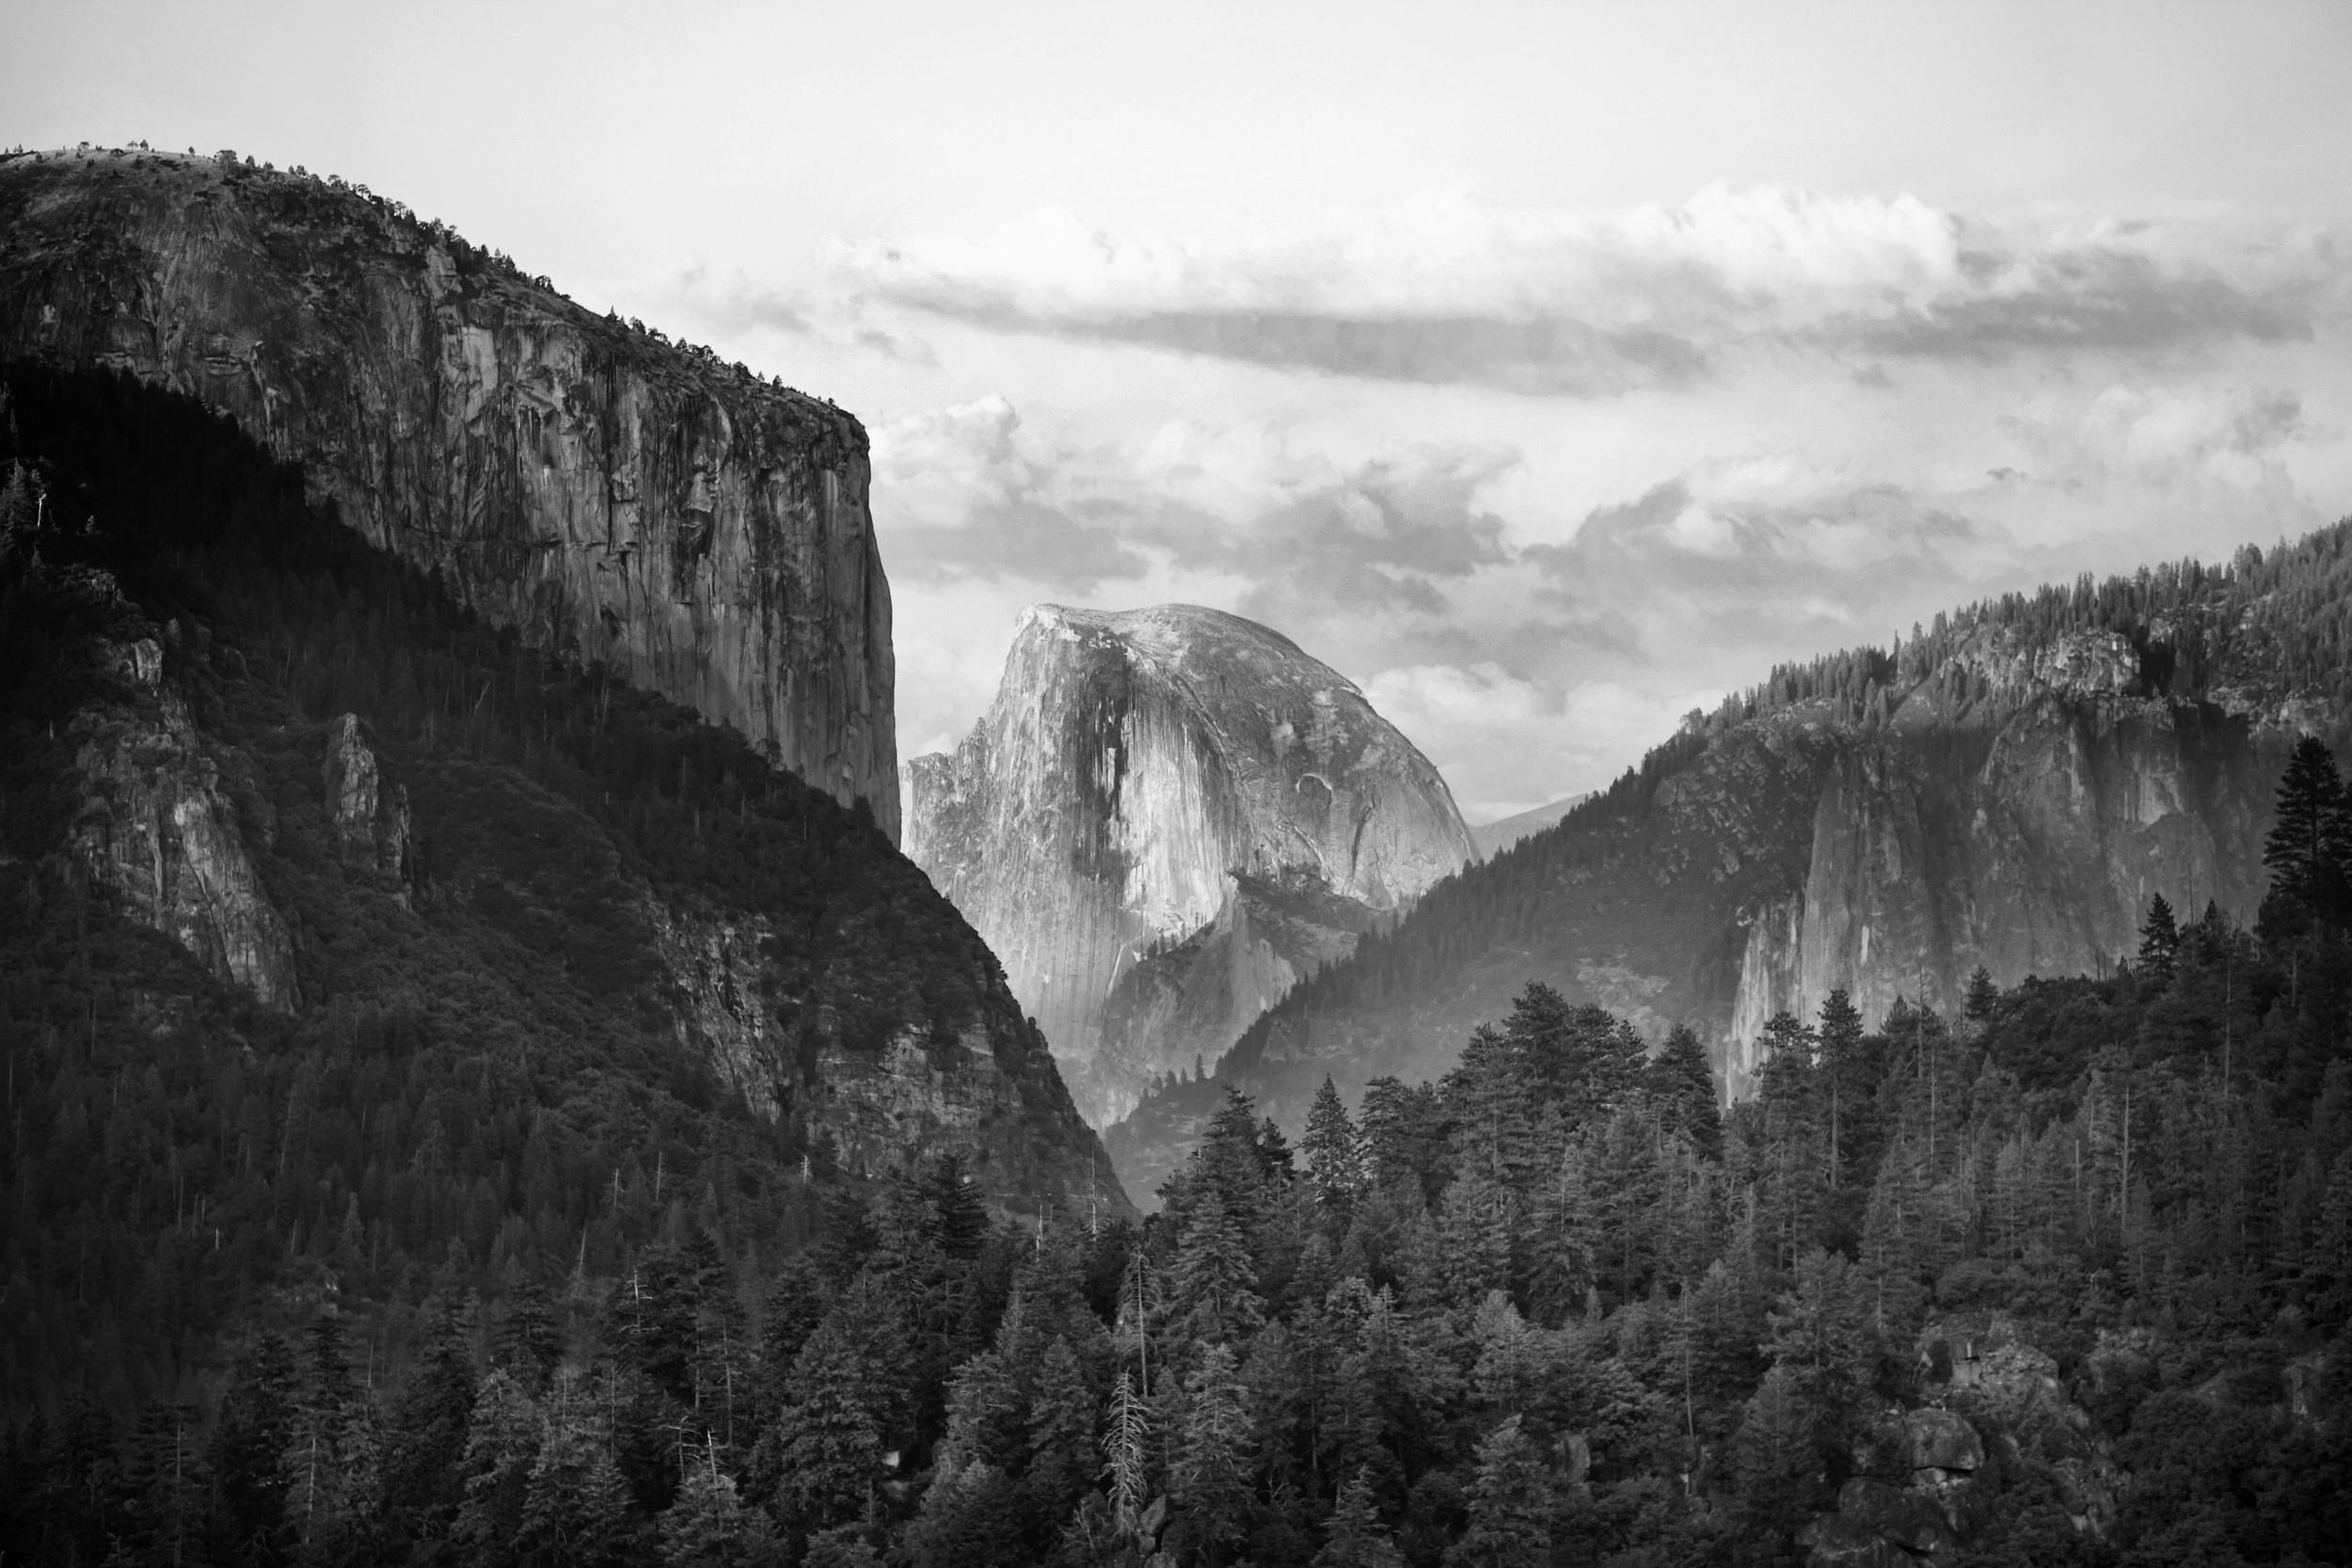 Halfdome: Yosemite National Park L. A. Lewin 2011